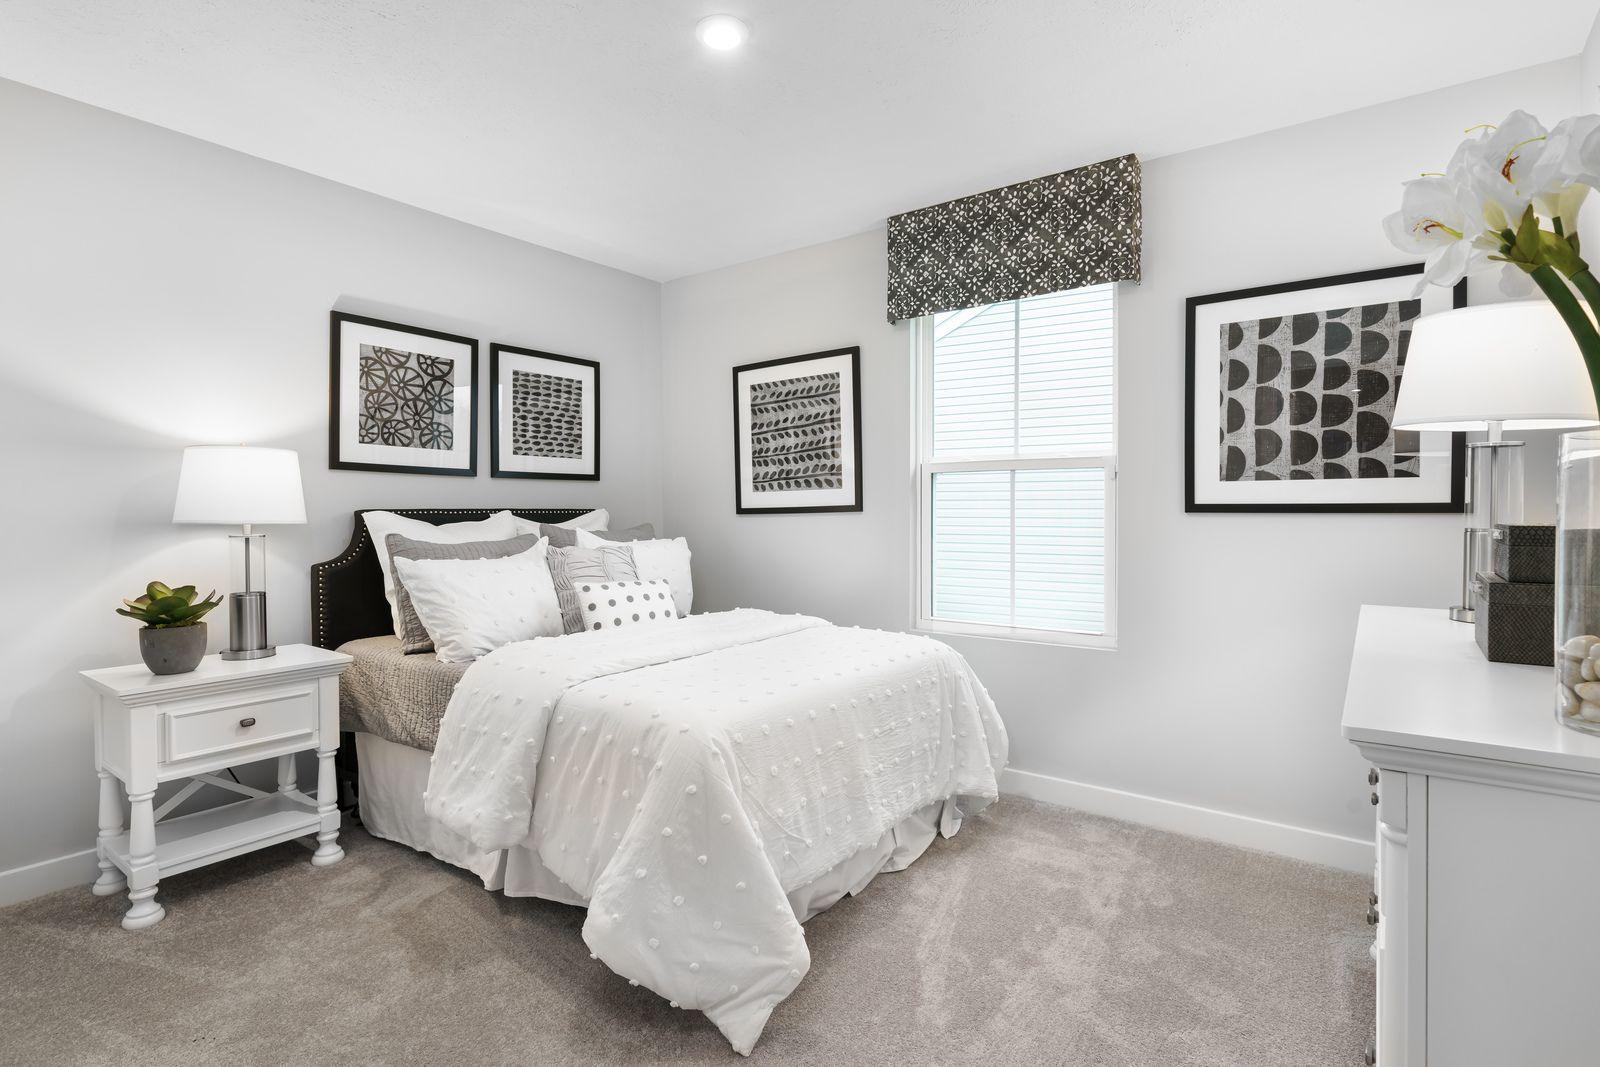 Bedroom featured in the Aruba Bay By Ryan Homes in Dover, DE